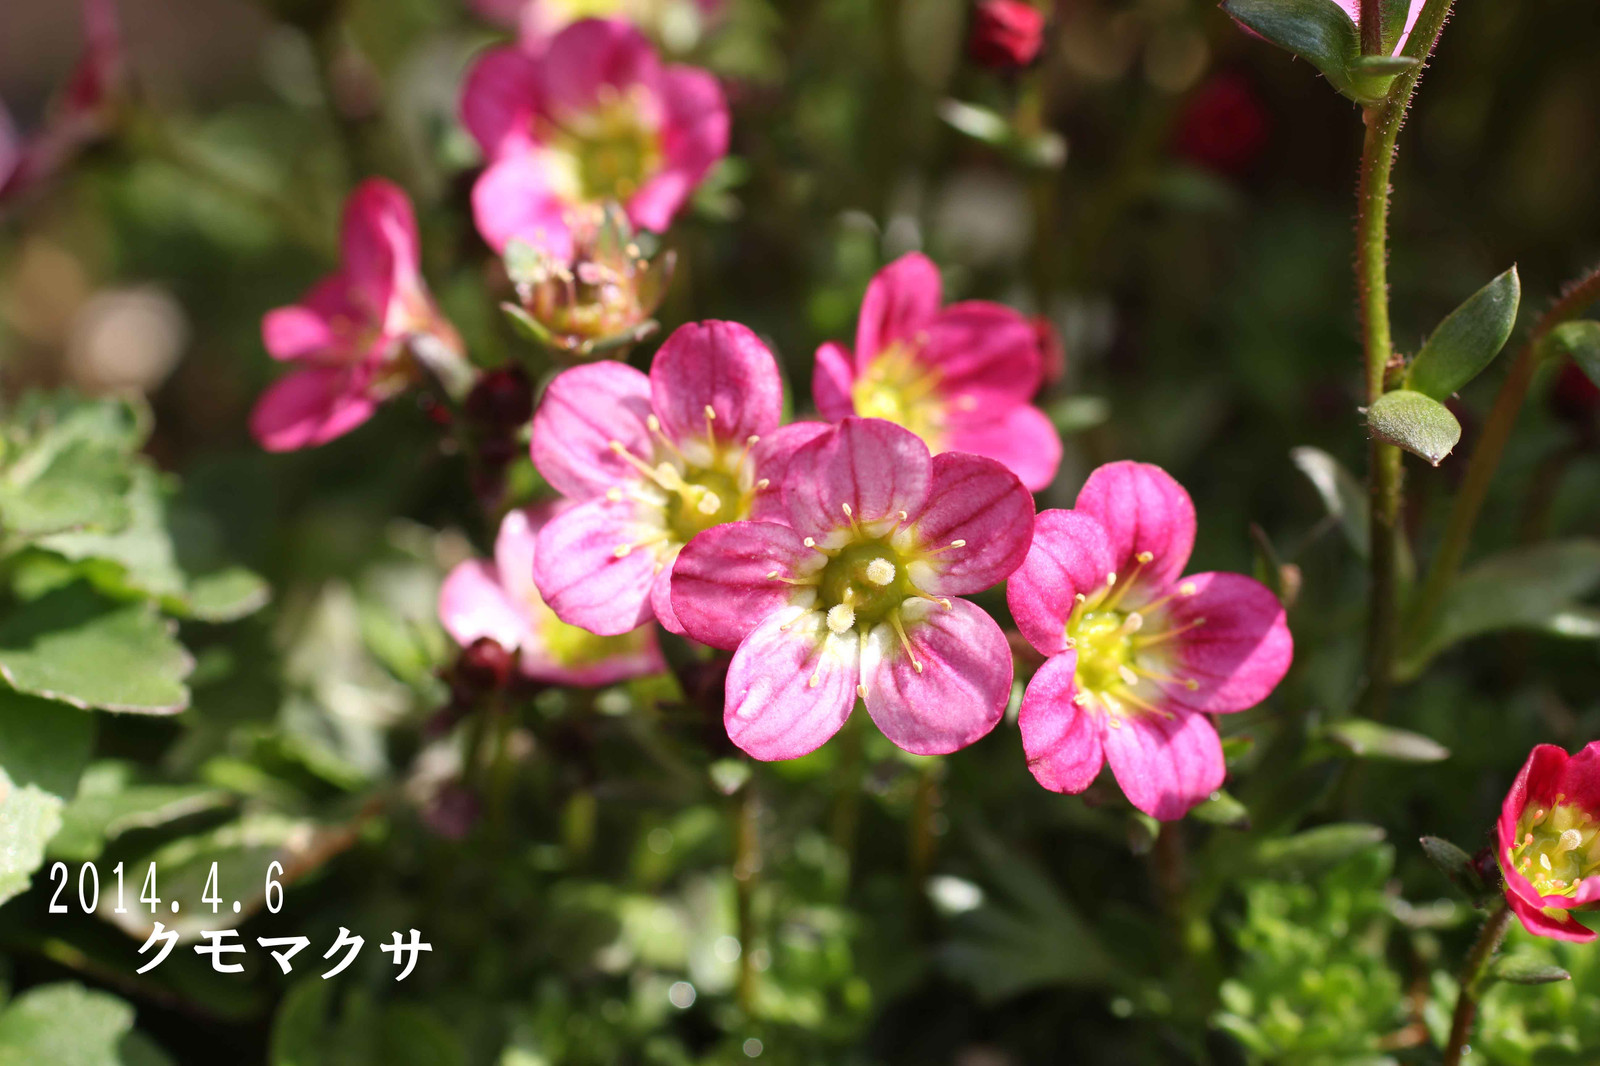 2014_04_06_7053_edited2